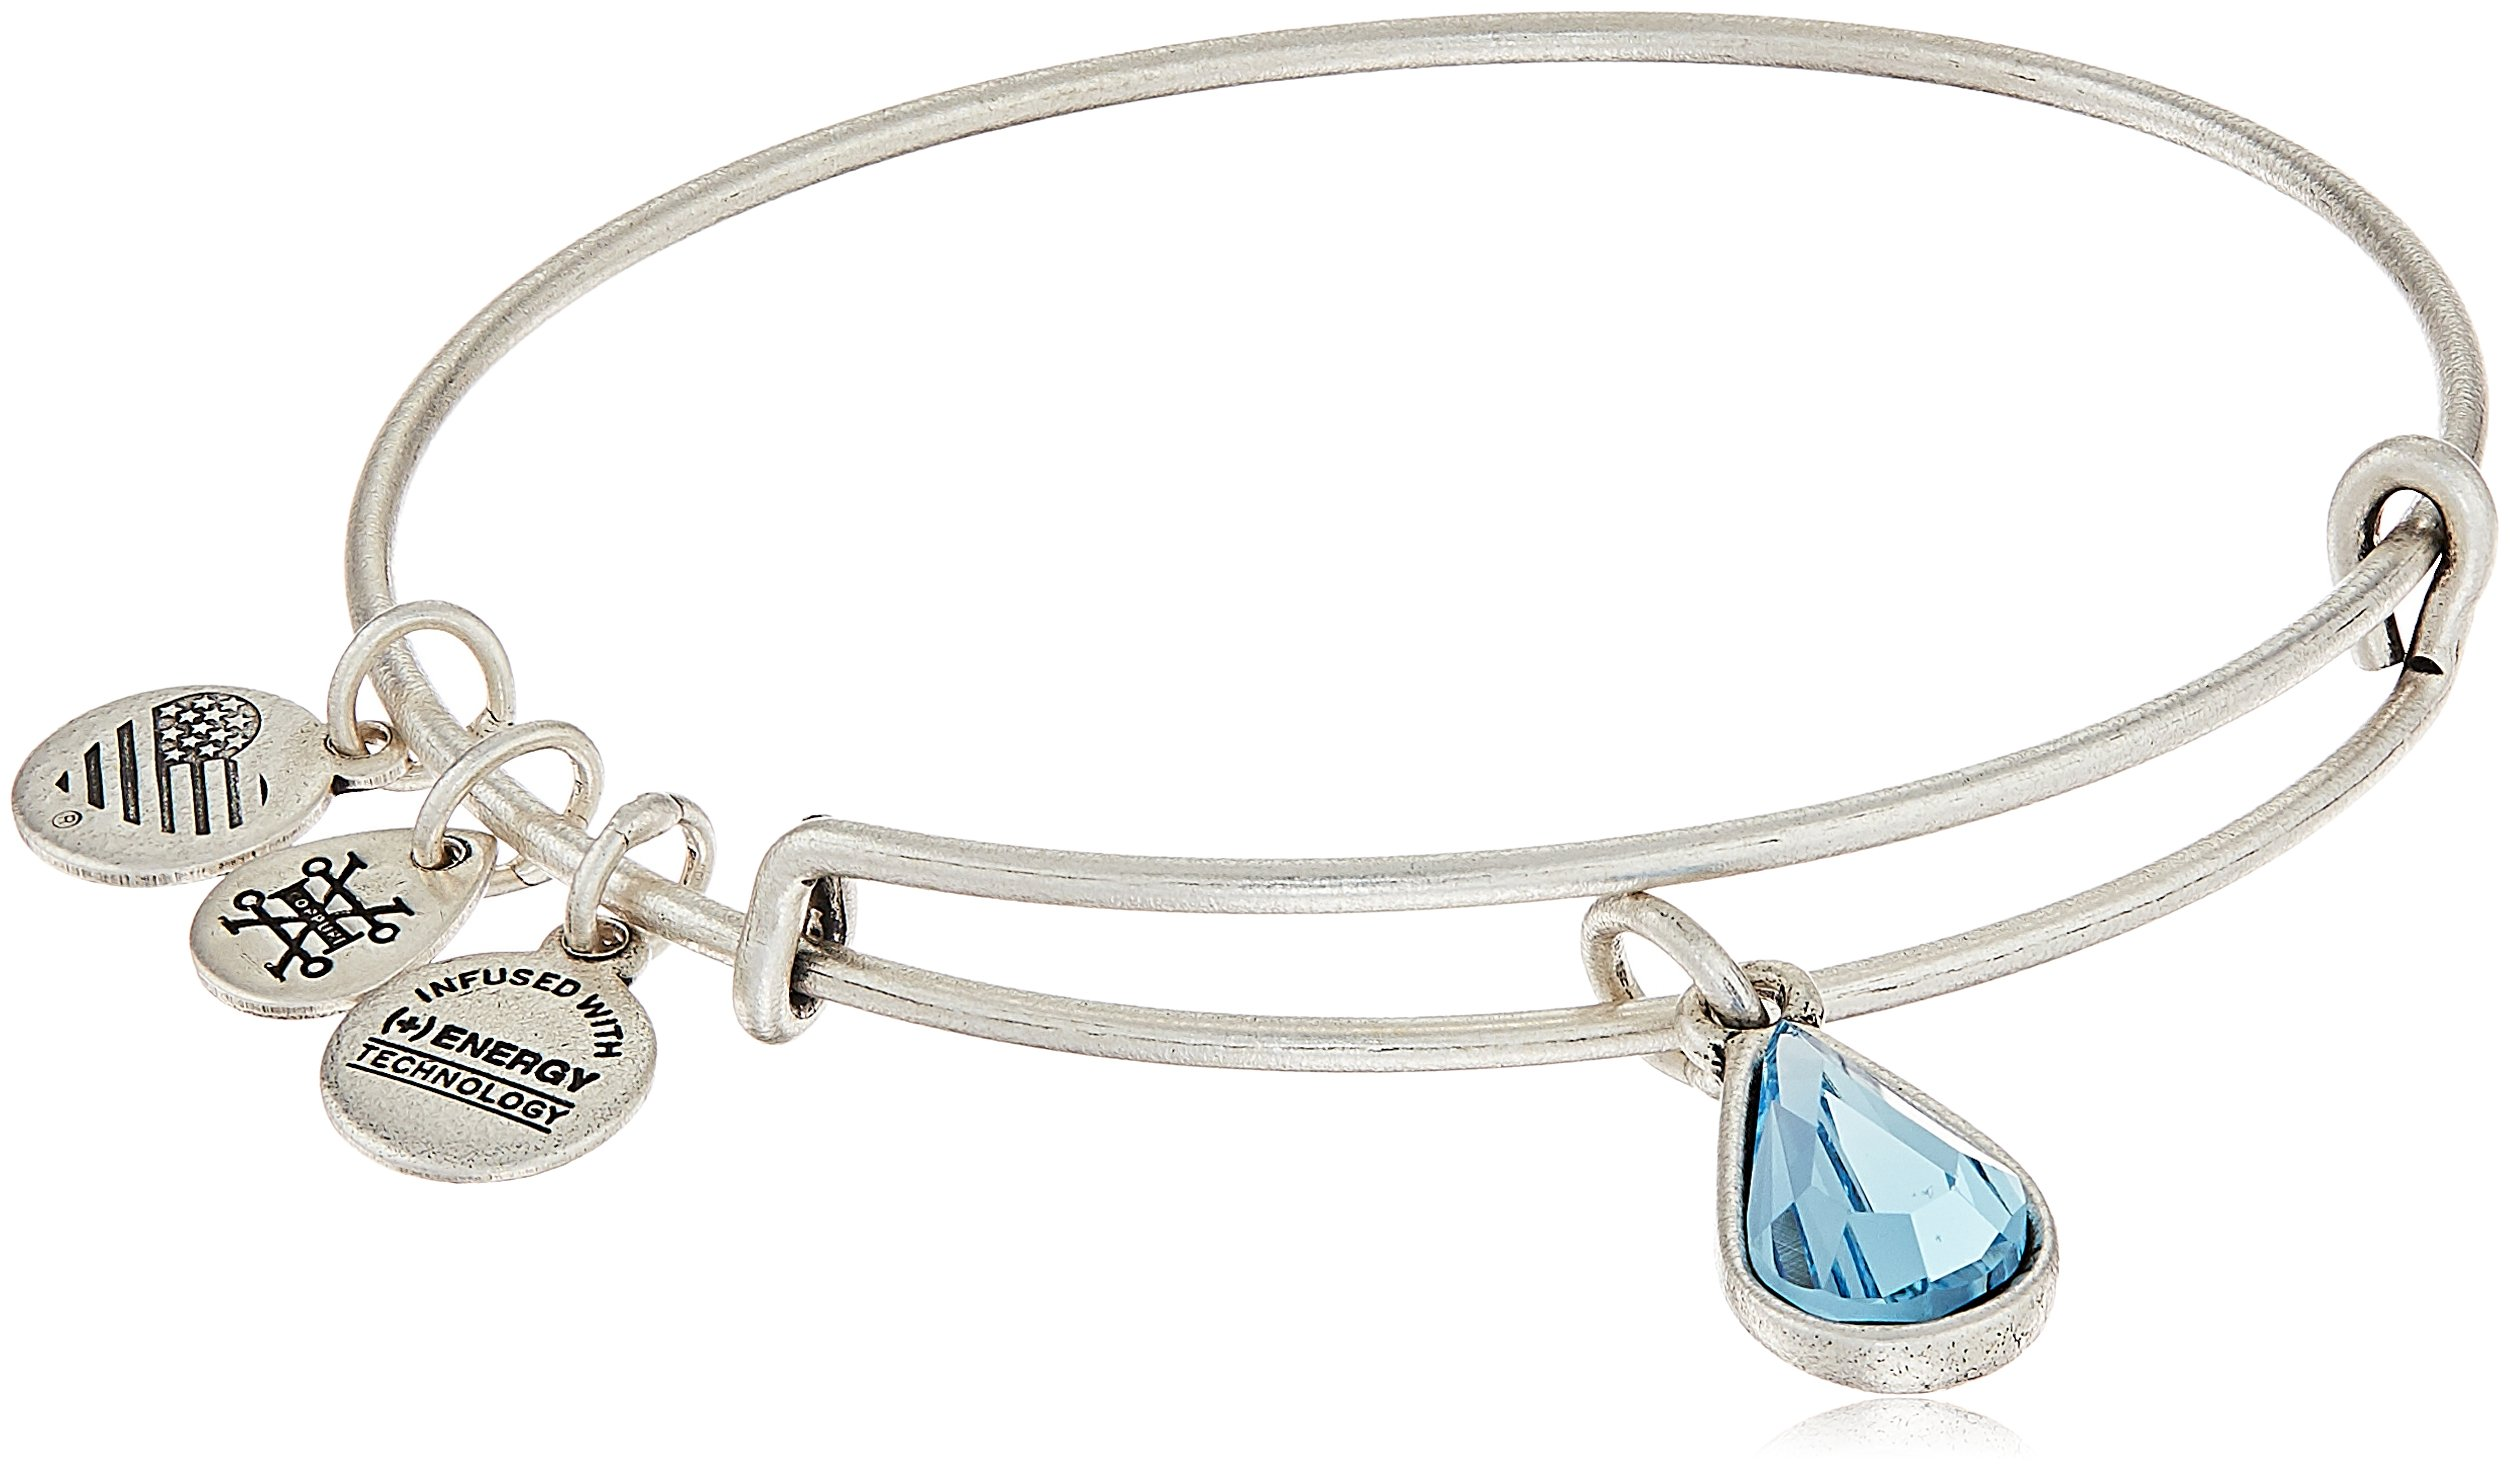 Alex and Ani March Birth Month Charm with Swarovski Crystal Rafaelian Silver Bangle Bracelet